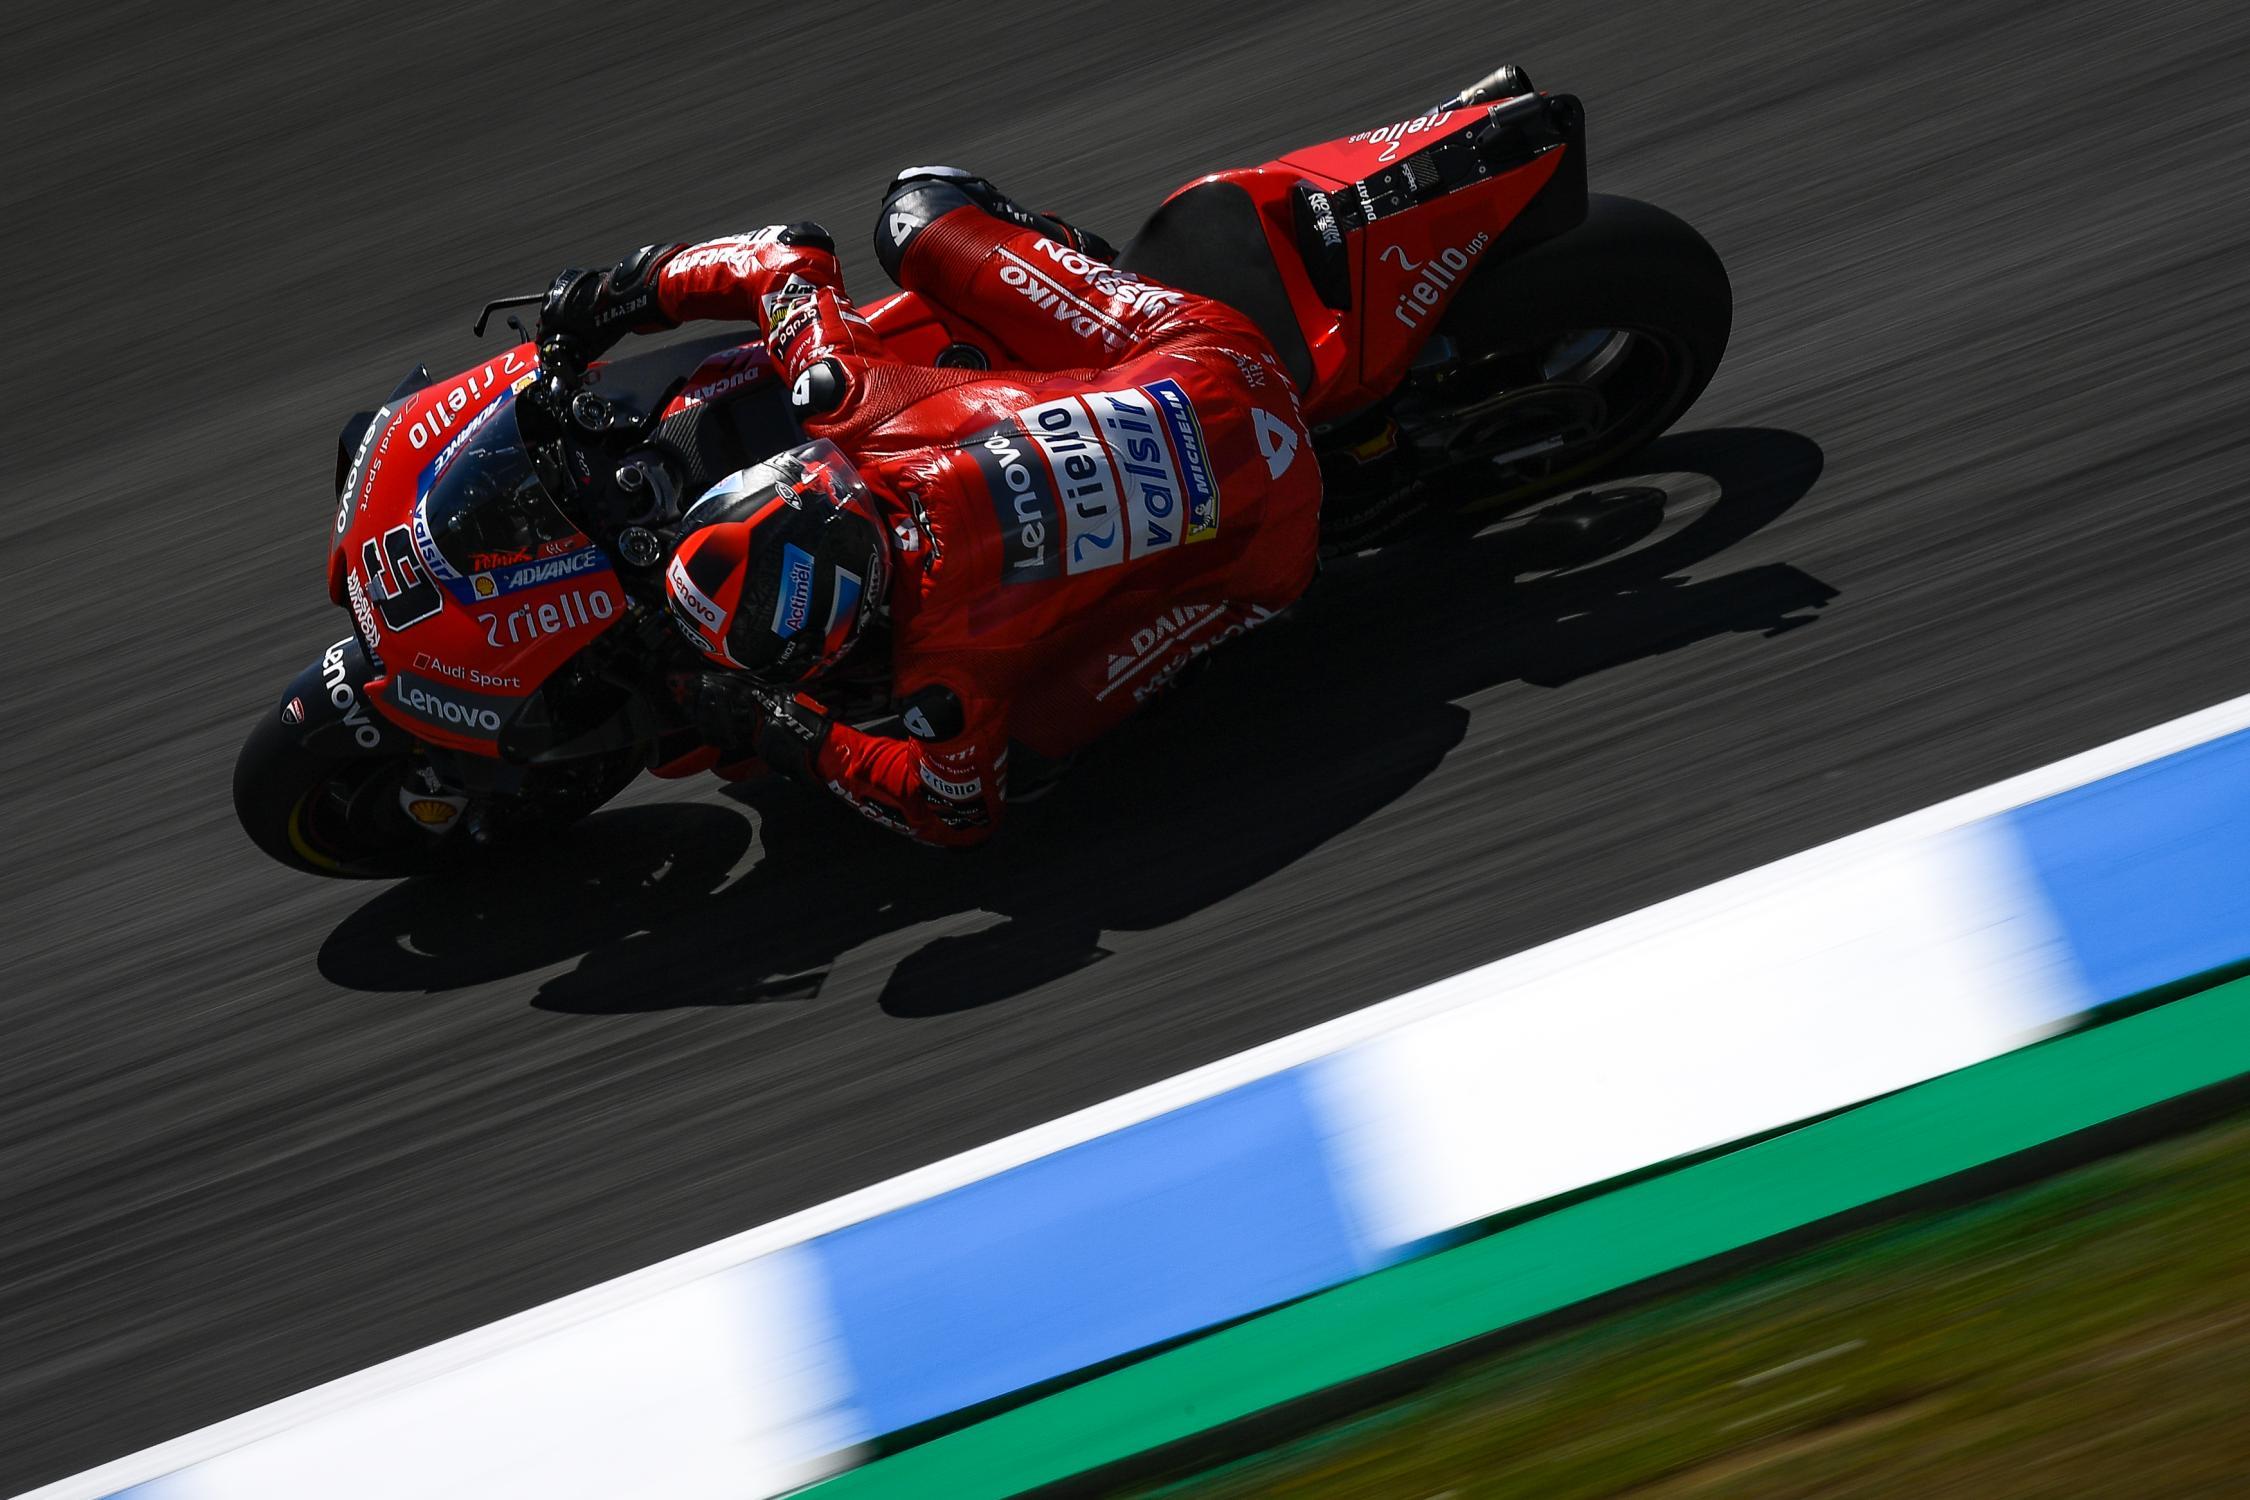 Tréninky MotoGP Španělska 2019